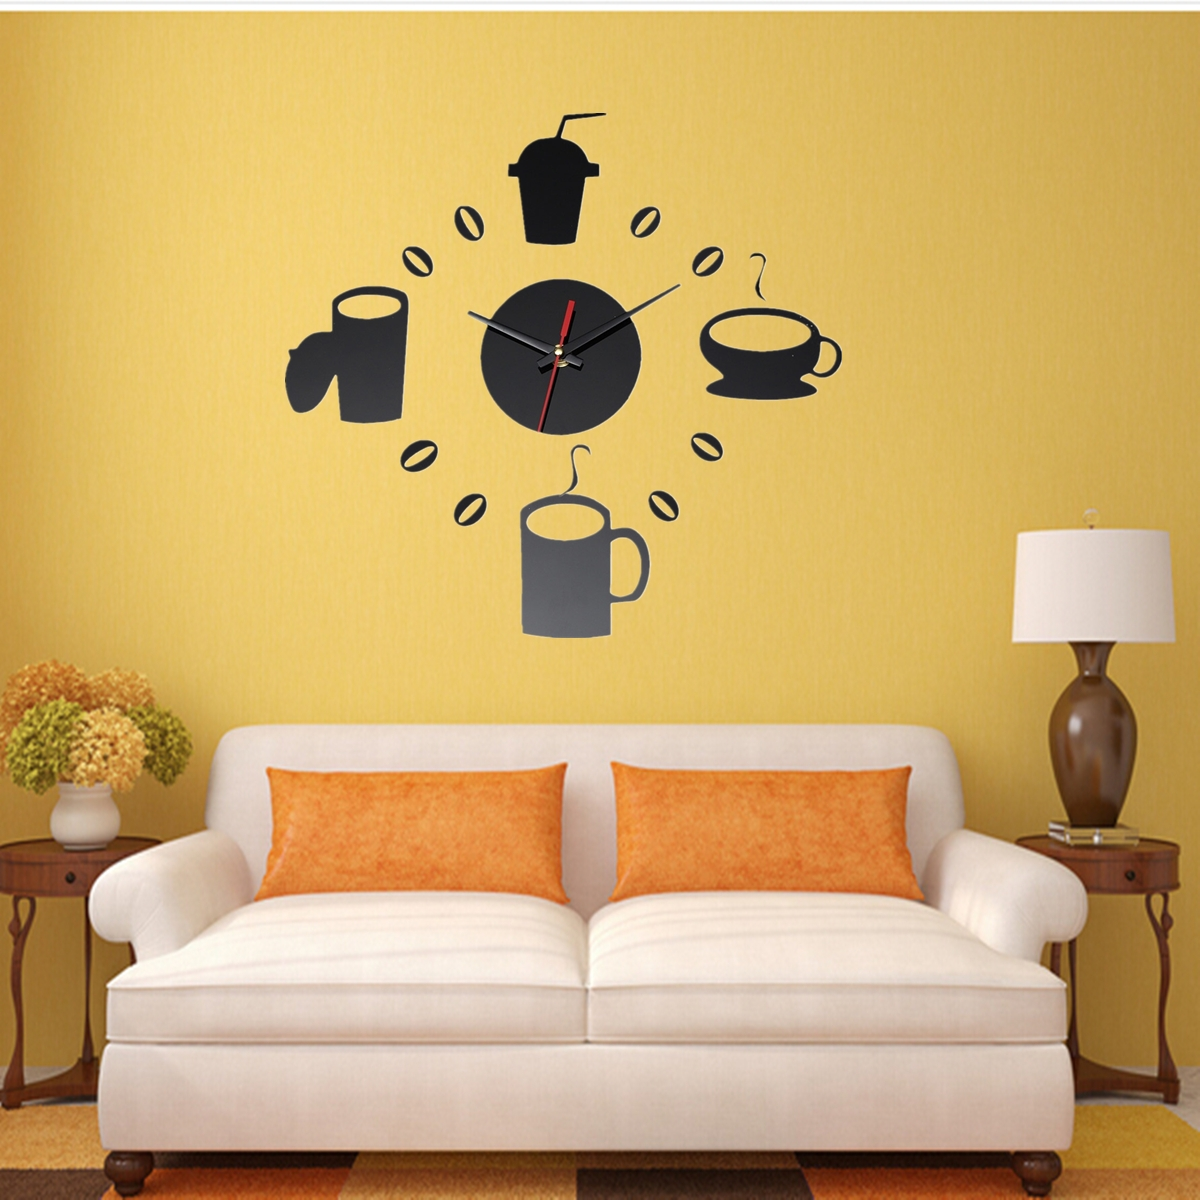 10 style trendy diy 3d horloge murale moderne pendule for Decoration salon maison